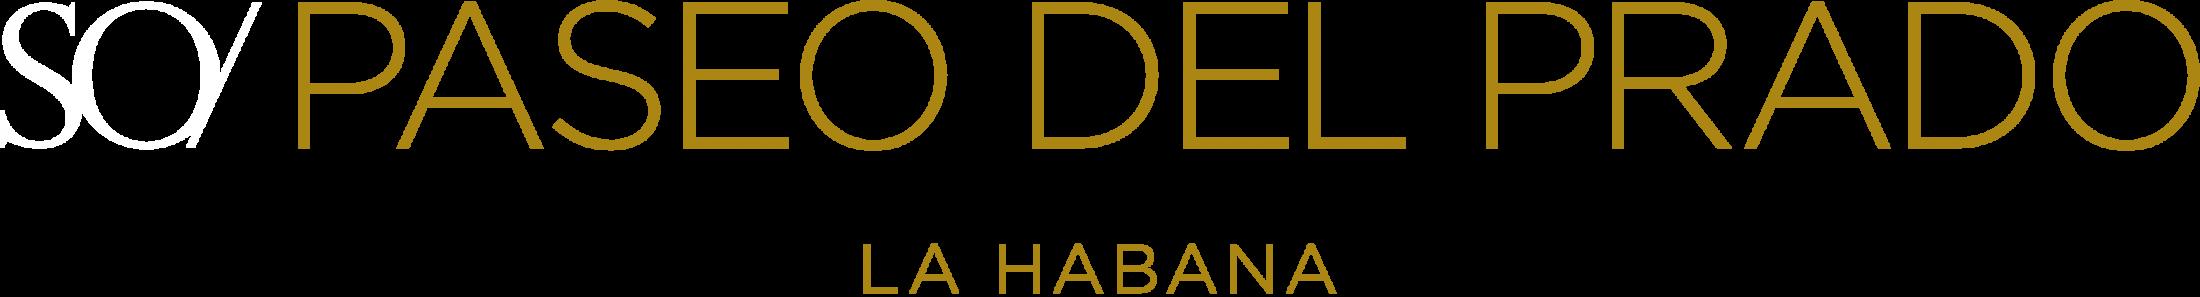 SO/ Paseo del Prado La Habana